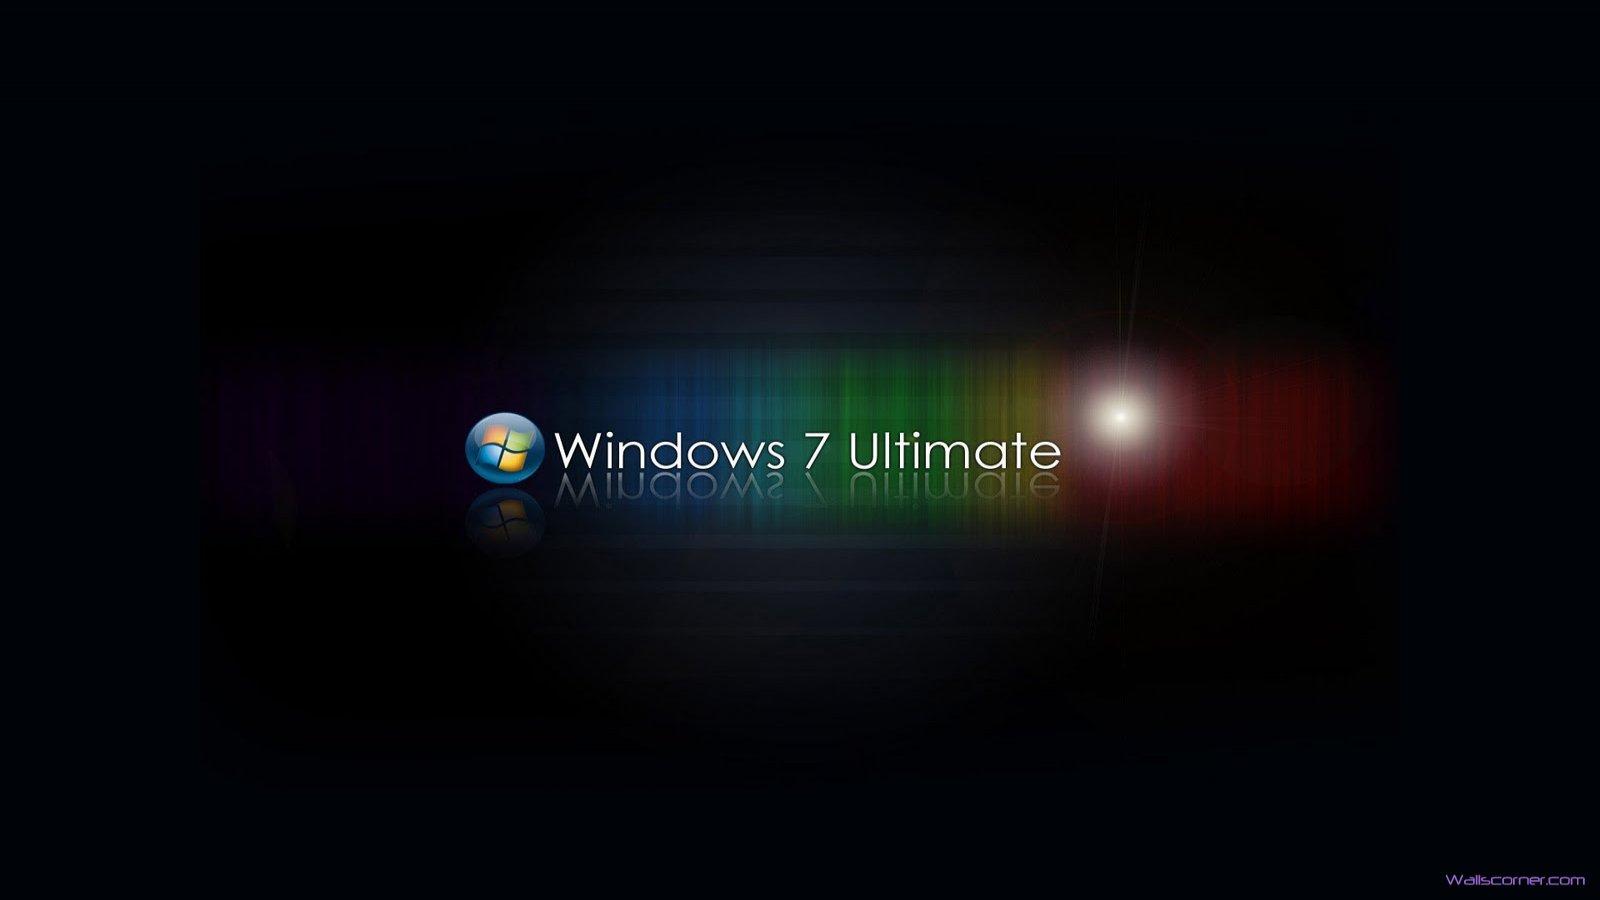 httpwallpaper95combeauty HD windows 7 ultimateHD 1600x900htm 1600x900